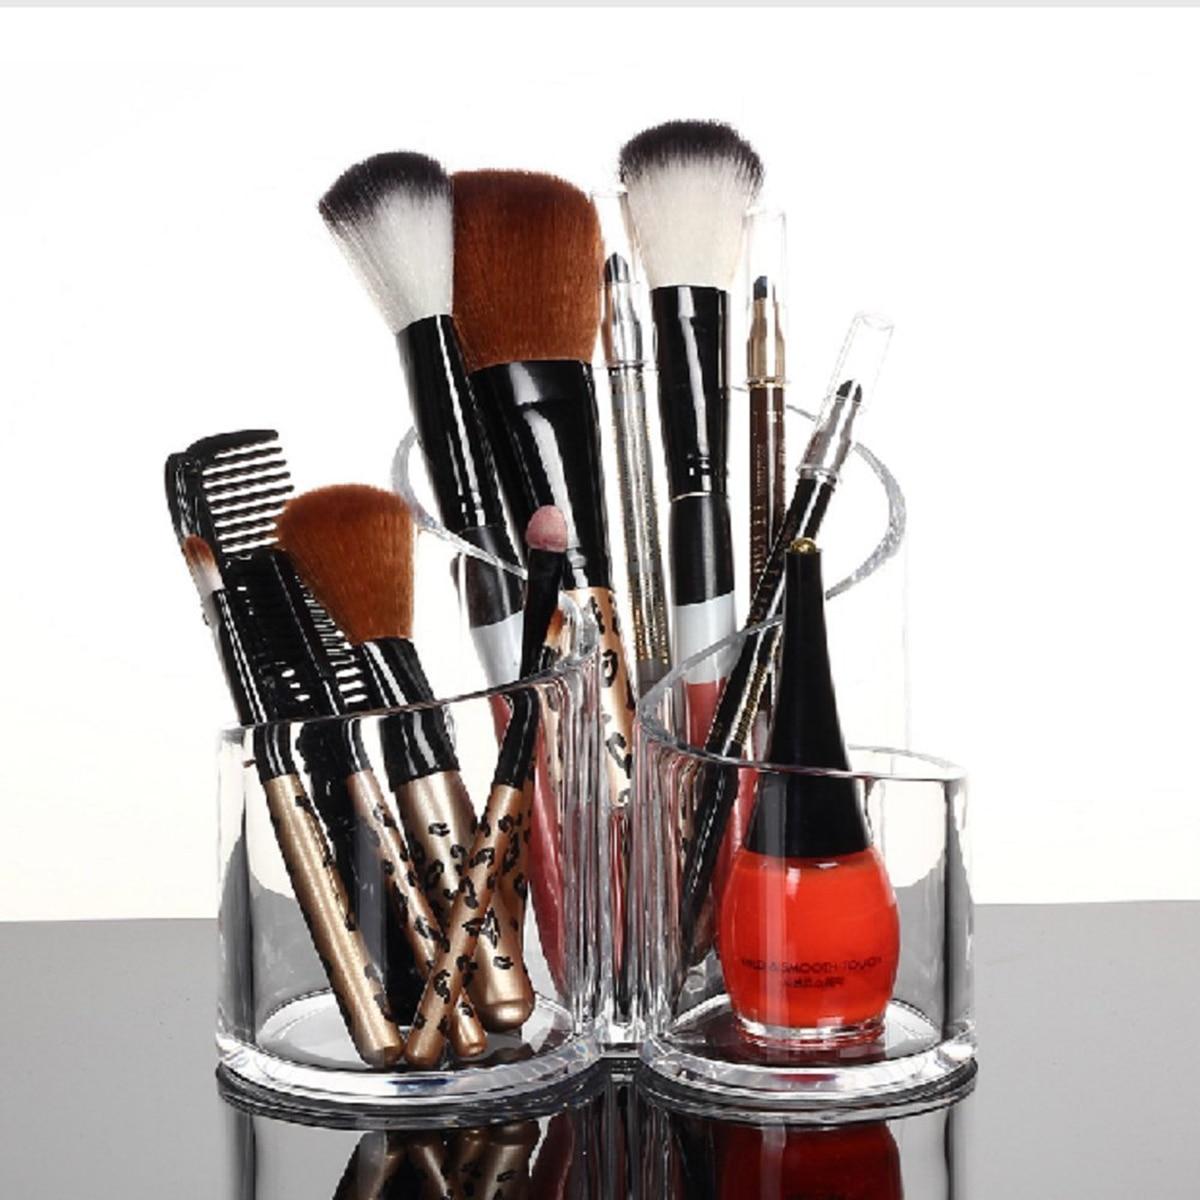 acrylic makeup brush organiser cosmetic holder makeup. Black Bedroom Furniture Sets. Home Design Ideas